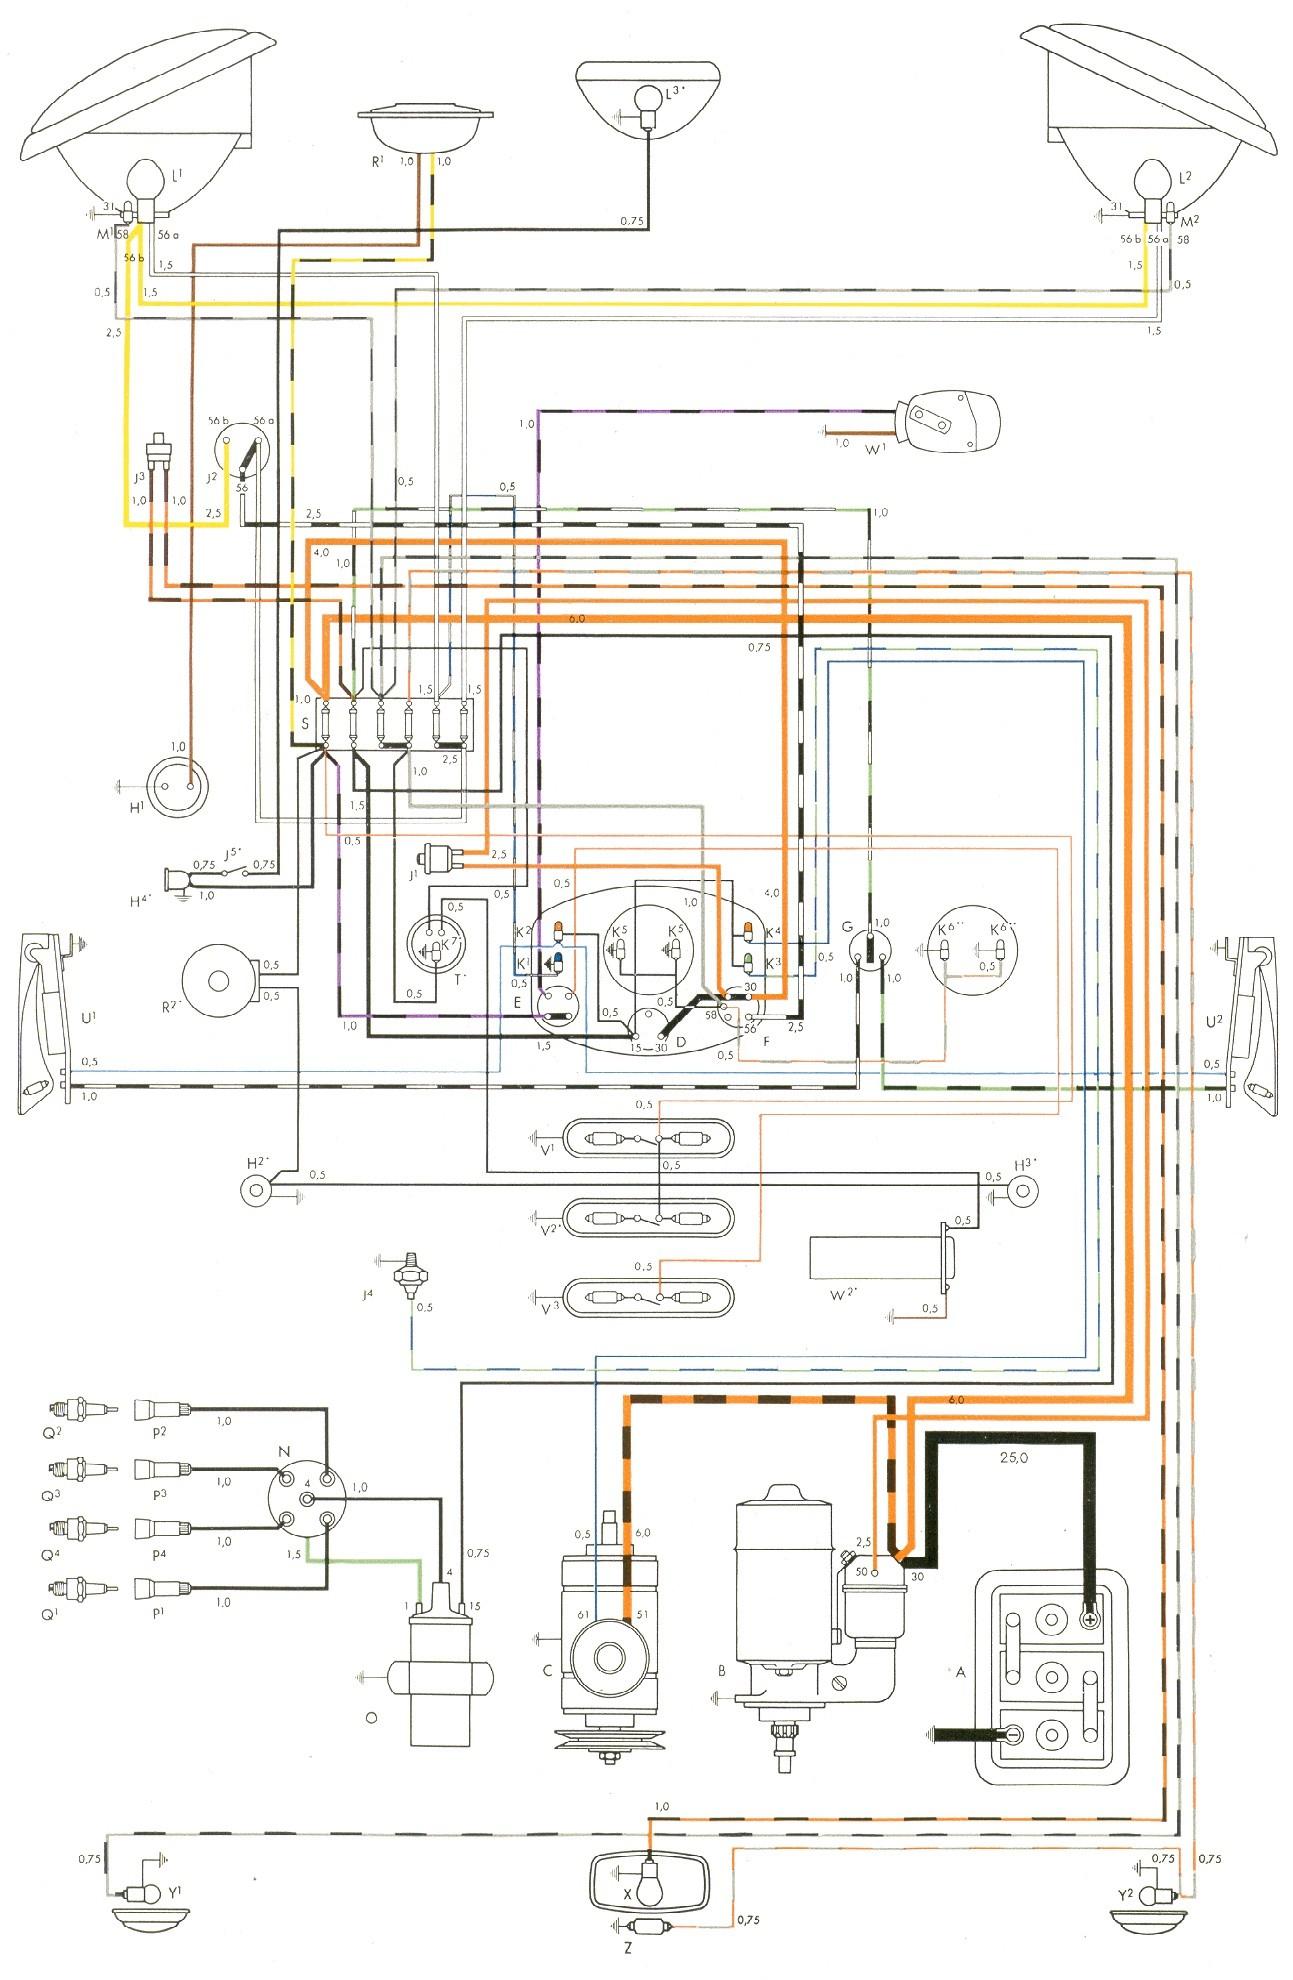 hight resolution of volkswagen bug engine diagram enthusiast wiring diagrams u2022 rh rasalibre co 1961 vw wiring diagram 1961